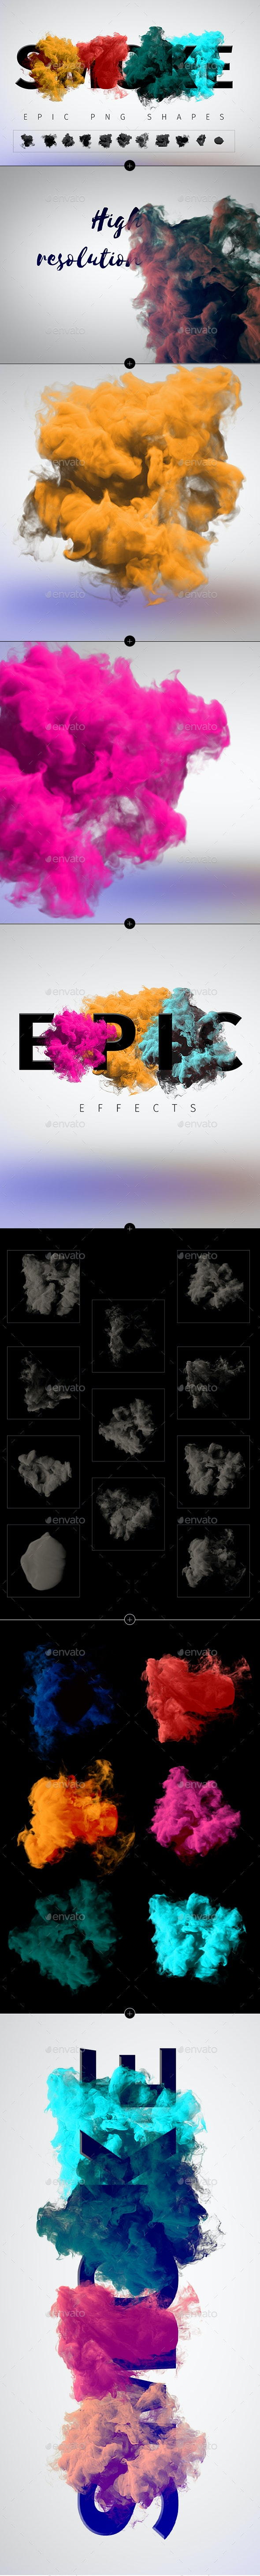 Smoke PNG Shapes - Miscellaneous Graphics